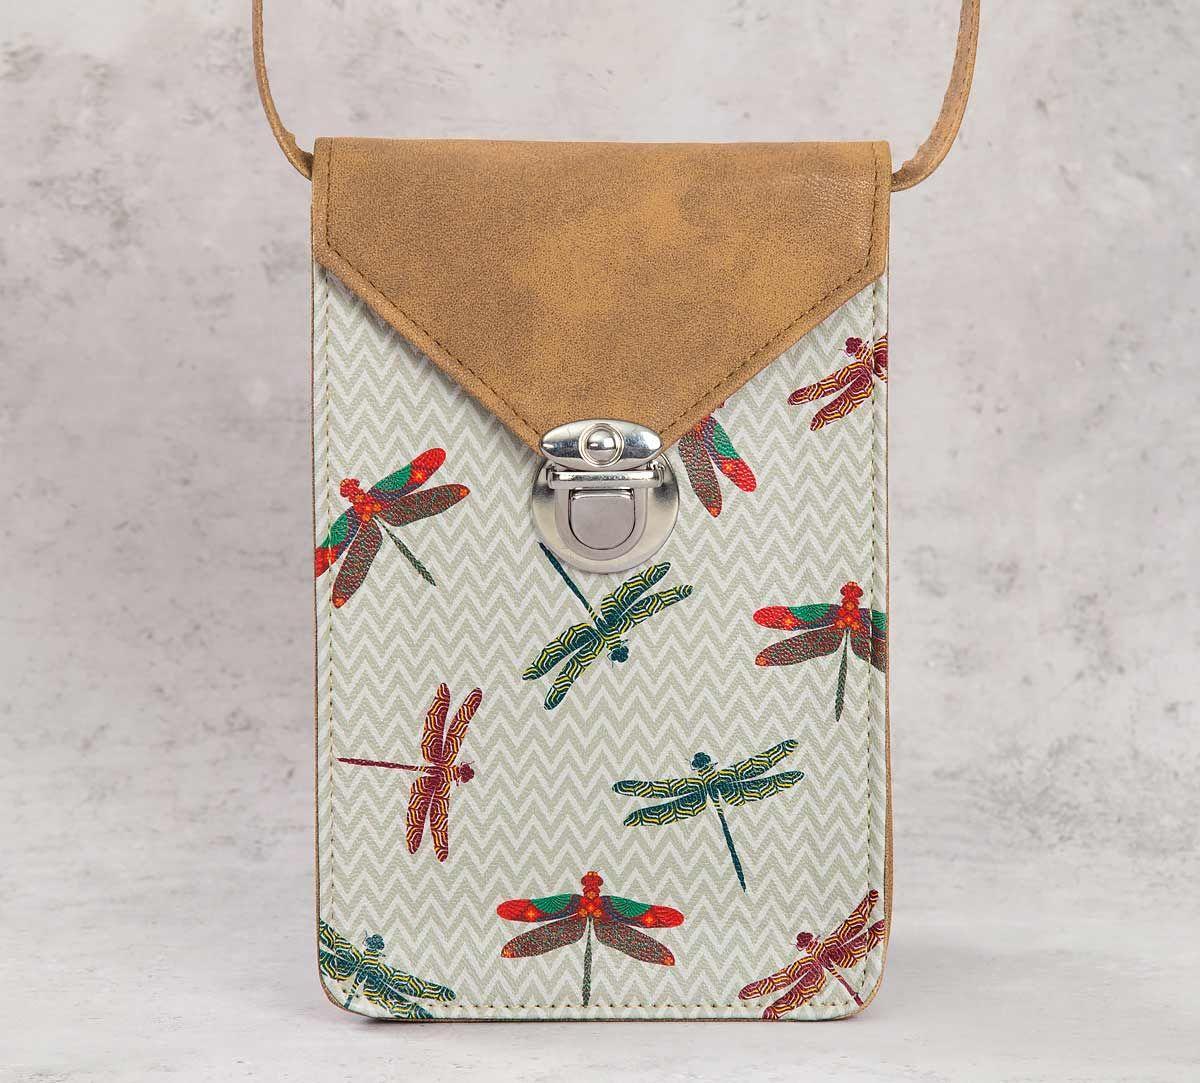 India Circus Chevron Butterflies Mobile Sling Bag